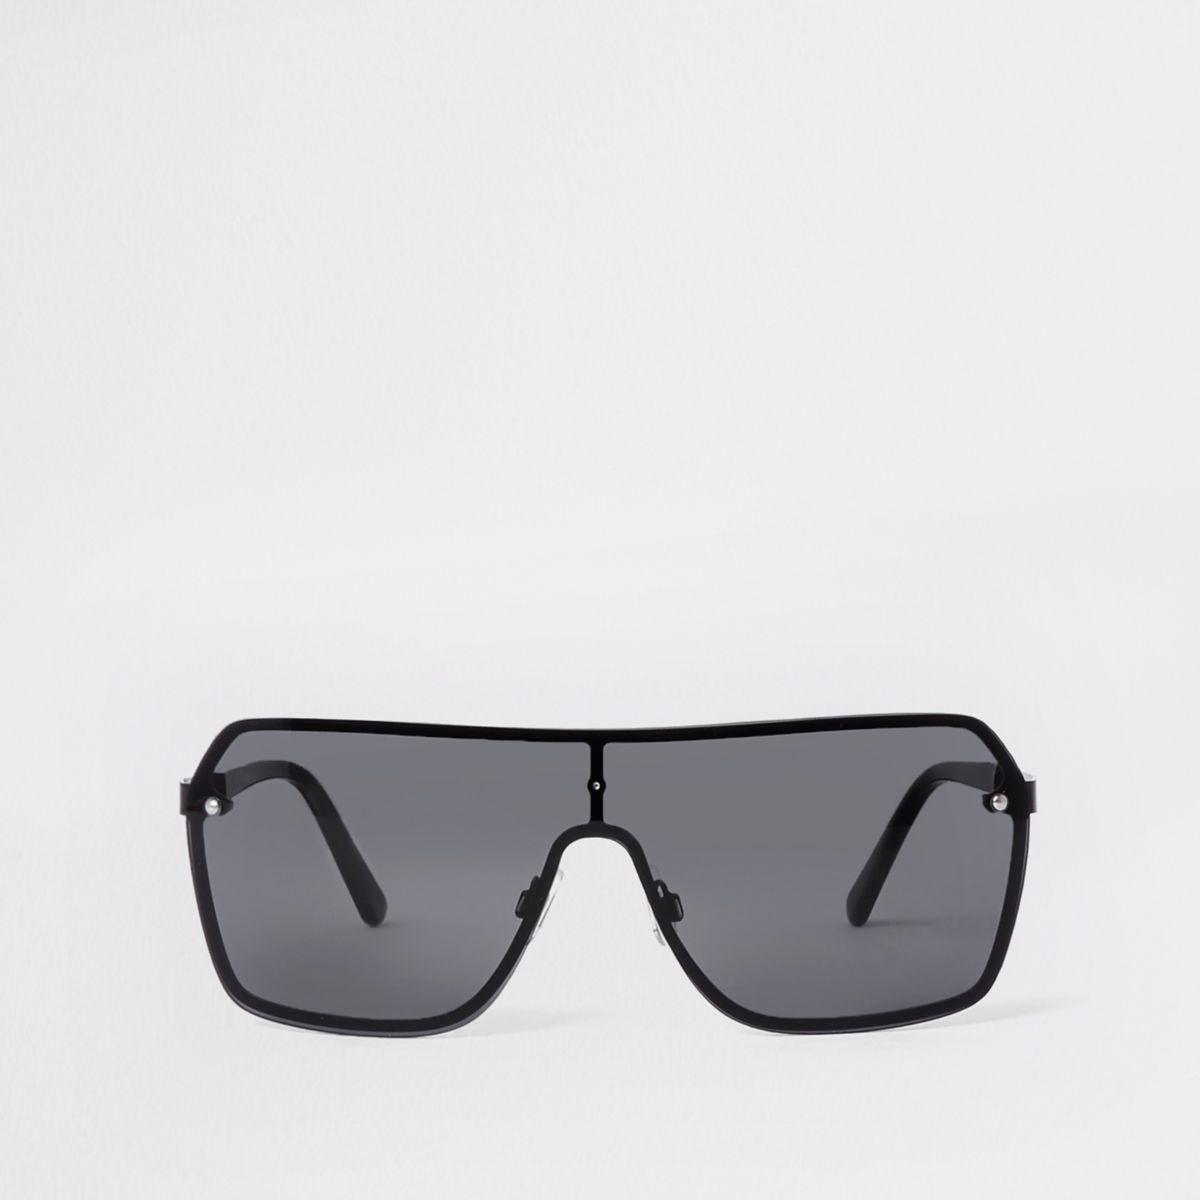 Zwarte pilotenzonnebril met spiegelglazen